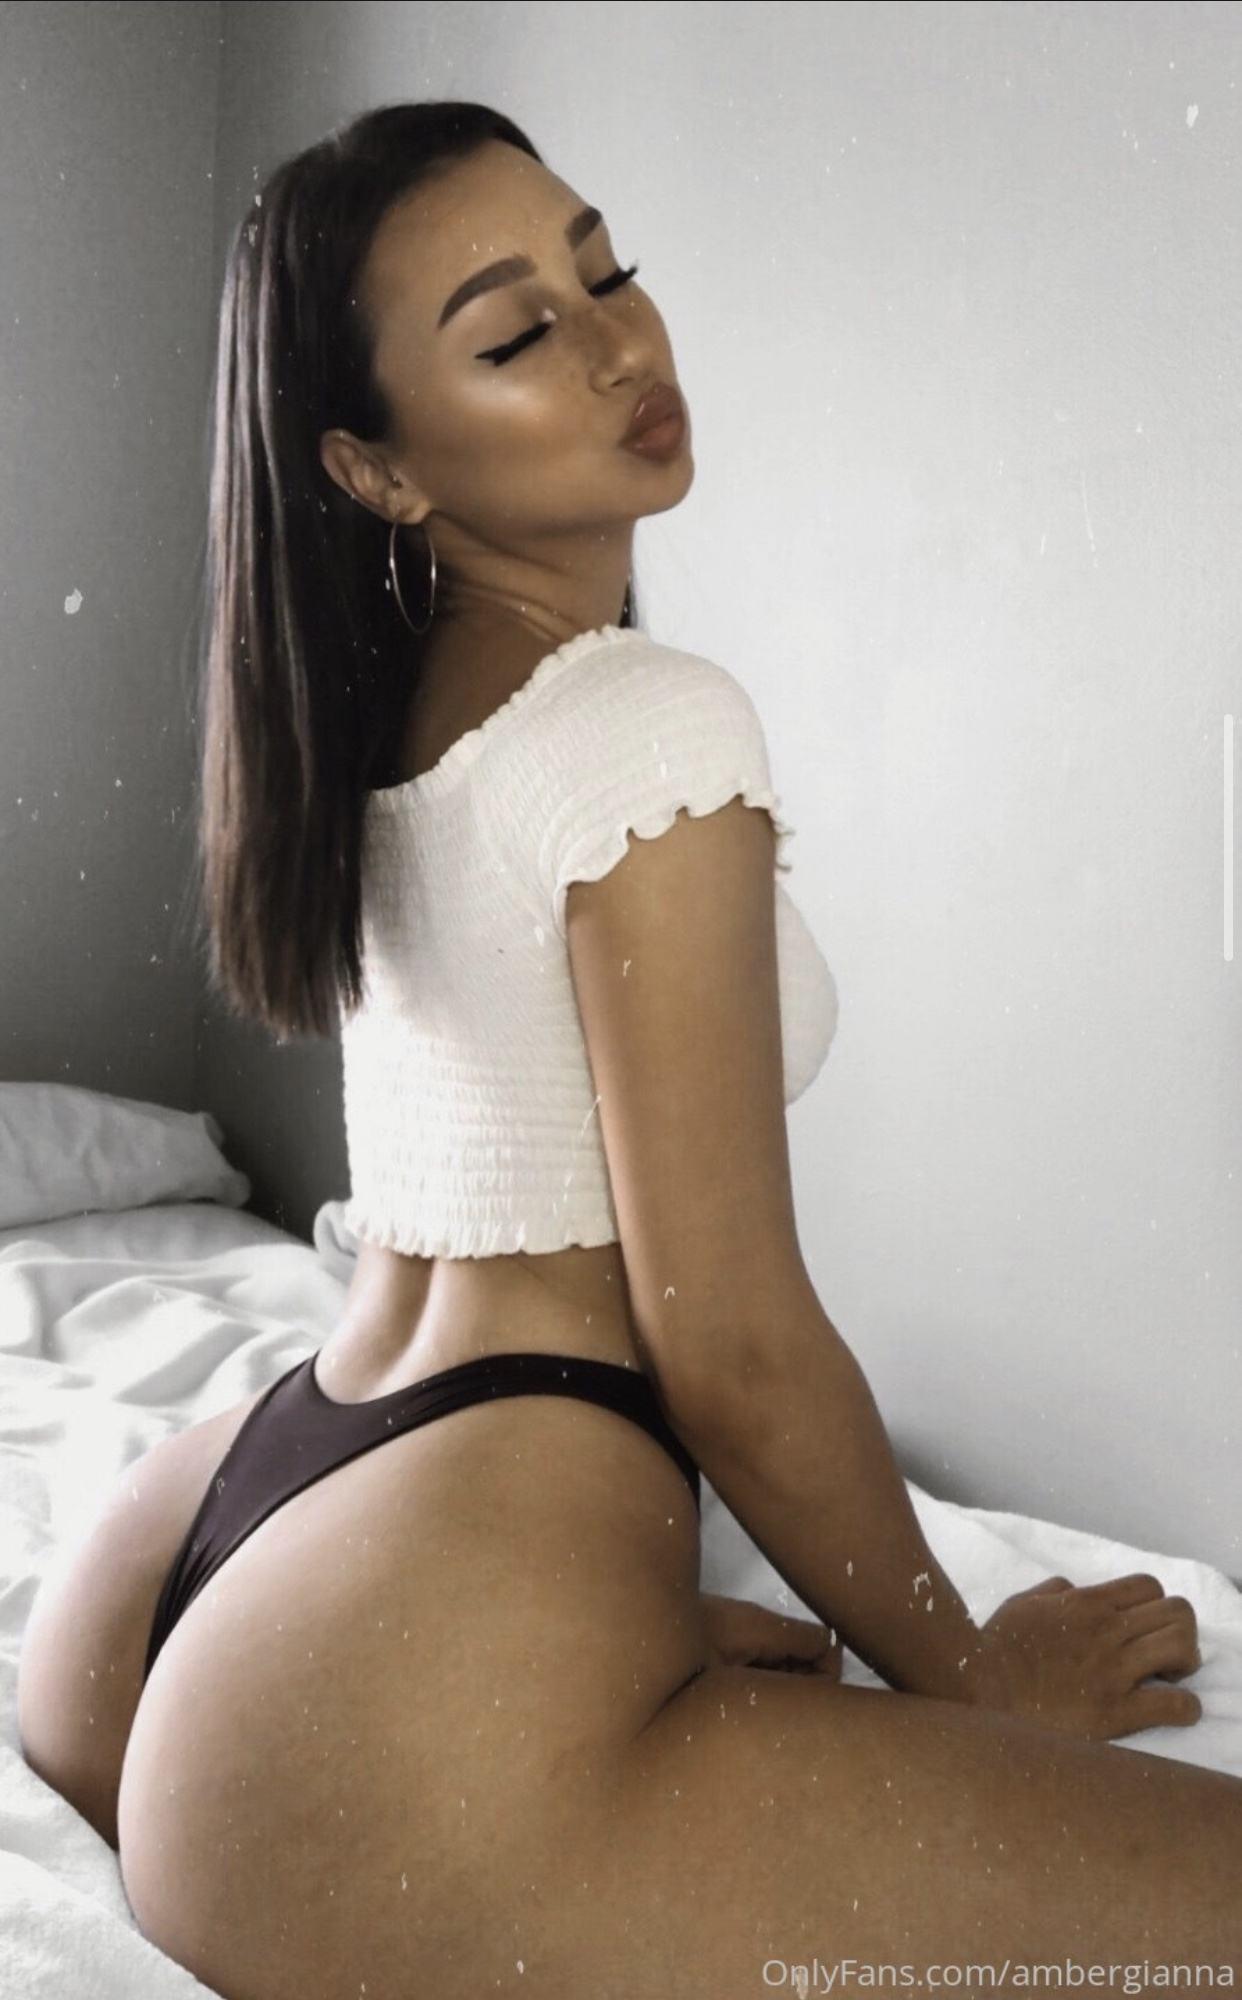 Amber Gianna Onlyfans 0041